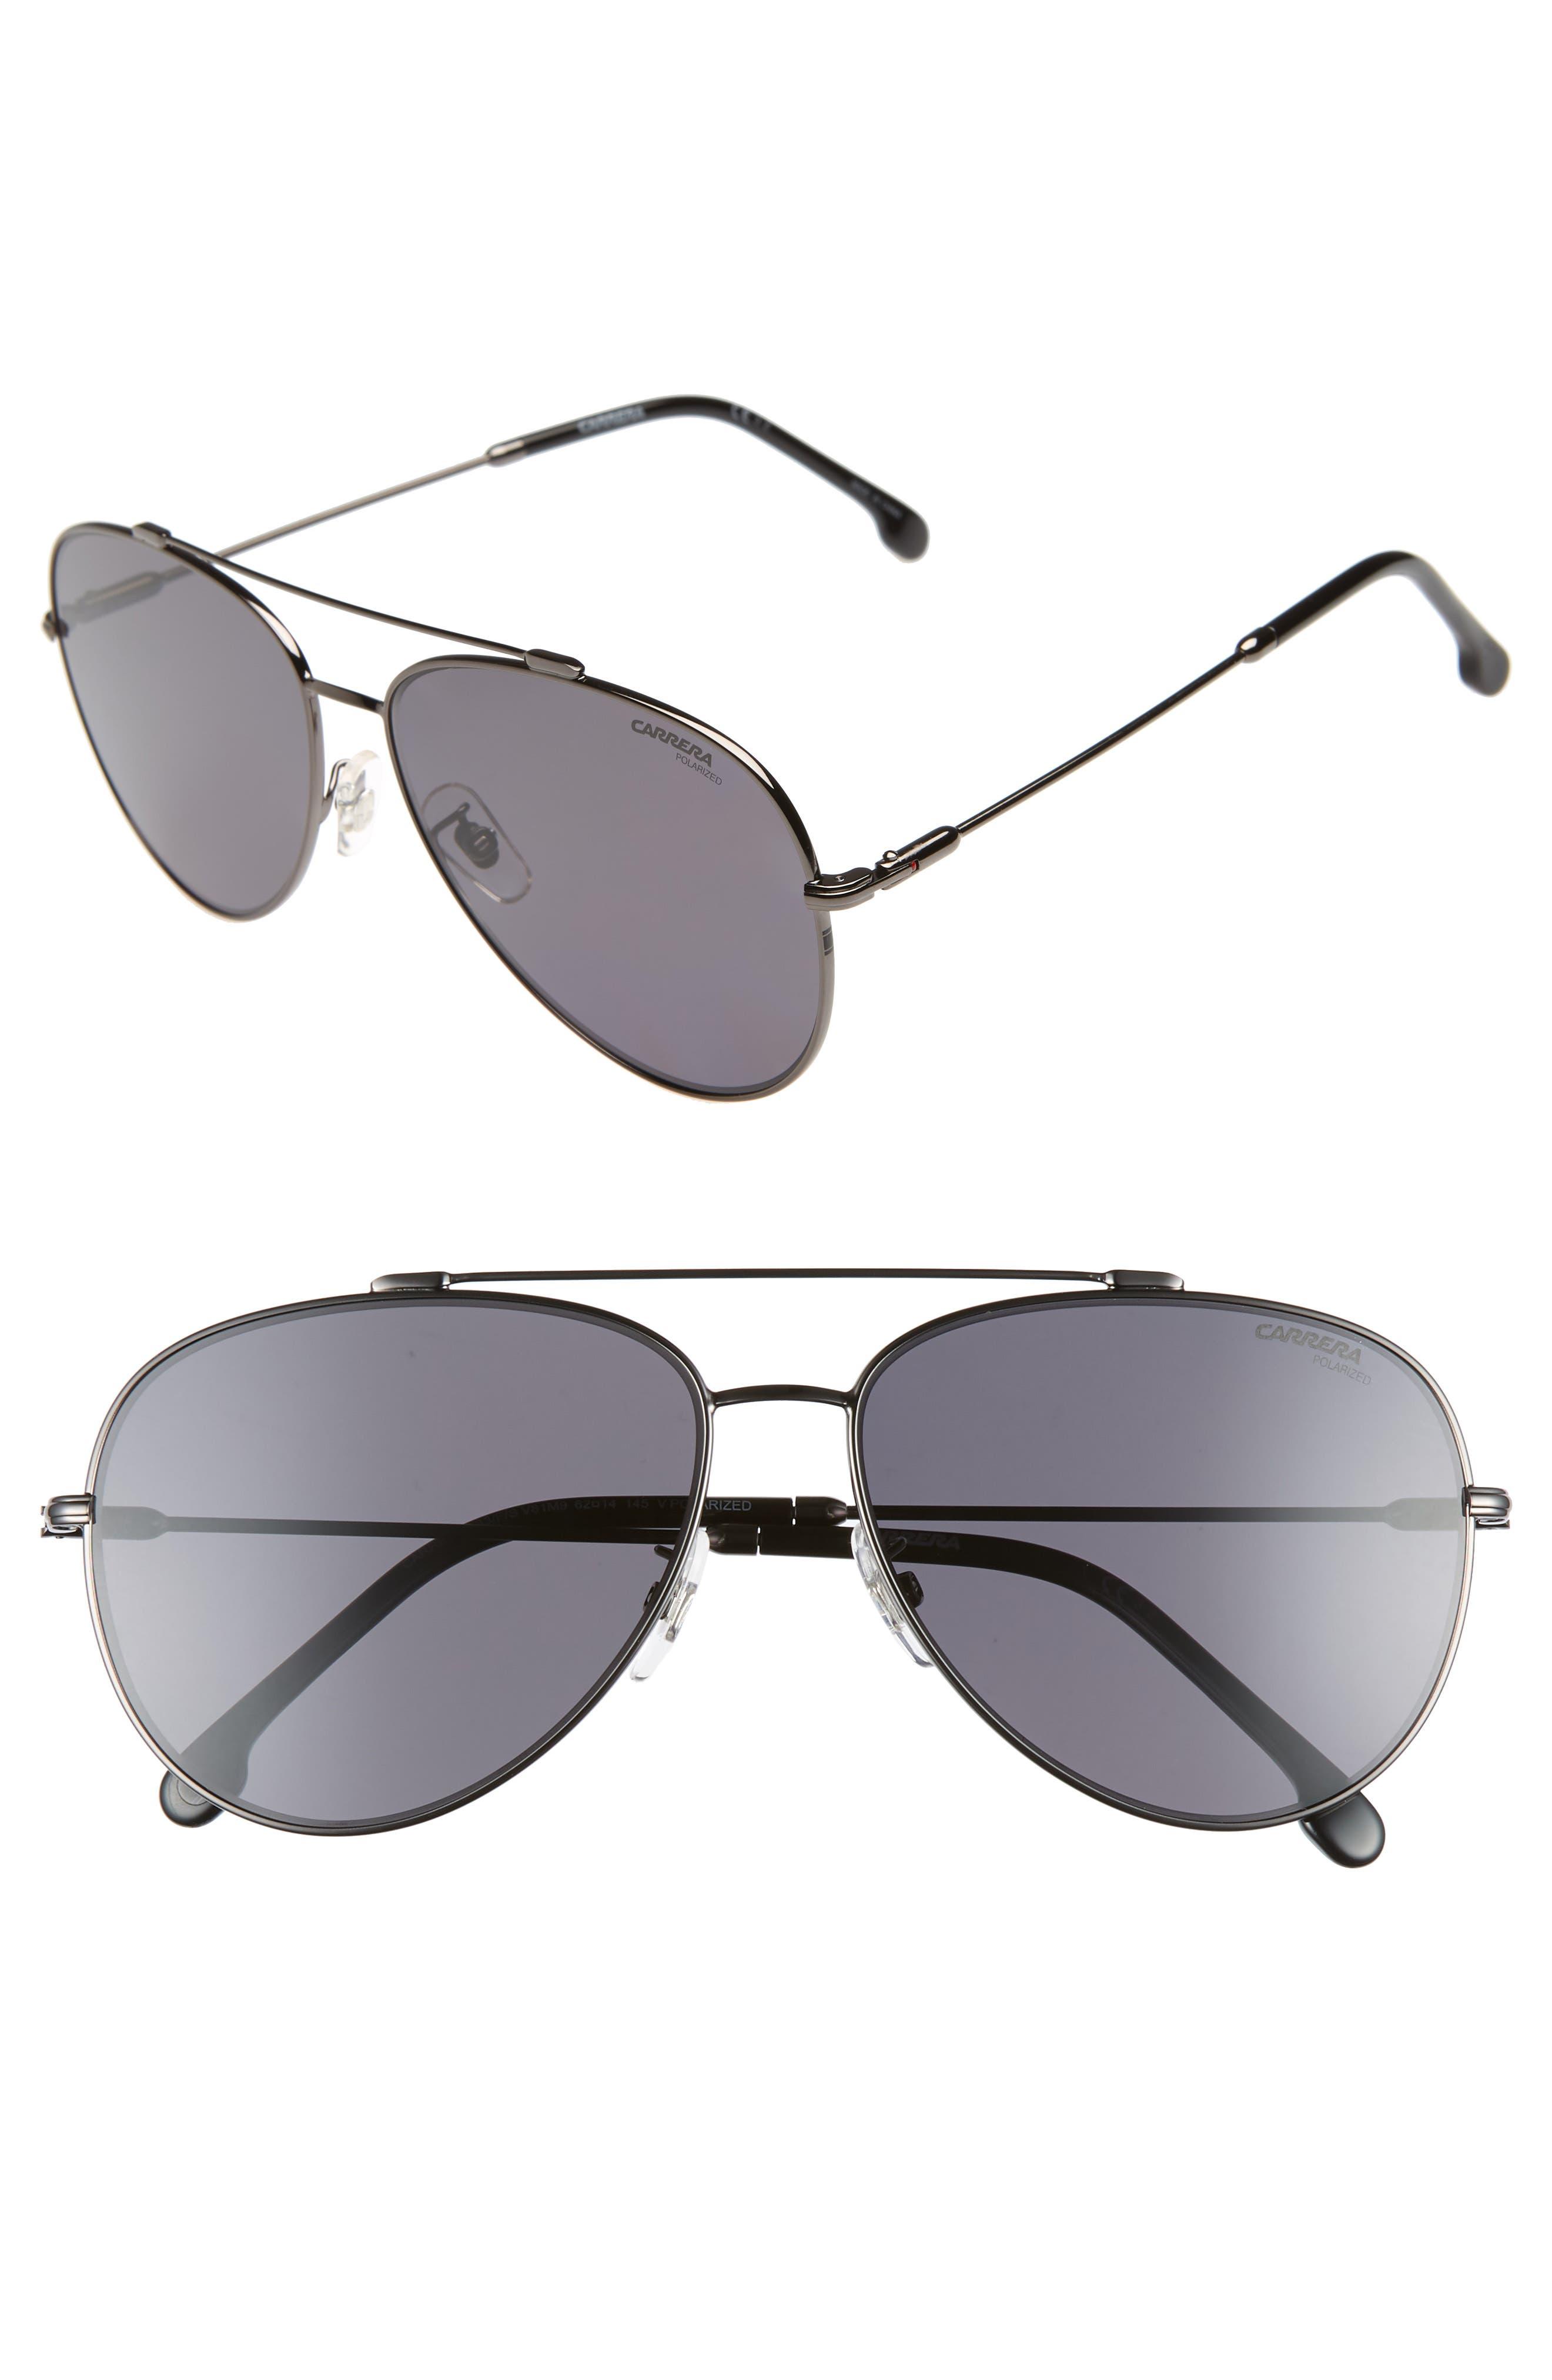 1185cef60b Carrera Eyewear 62Mm Polarized Aviator Sunglasses -